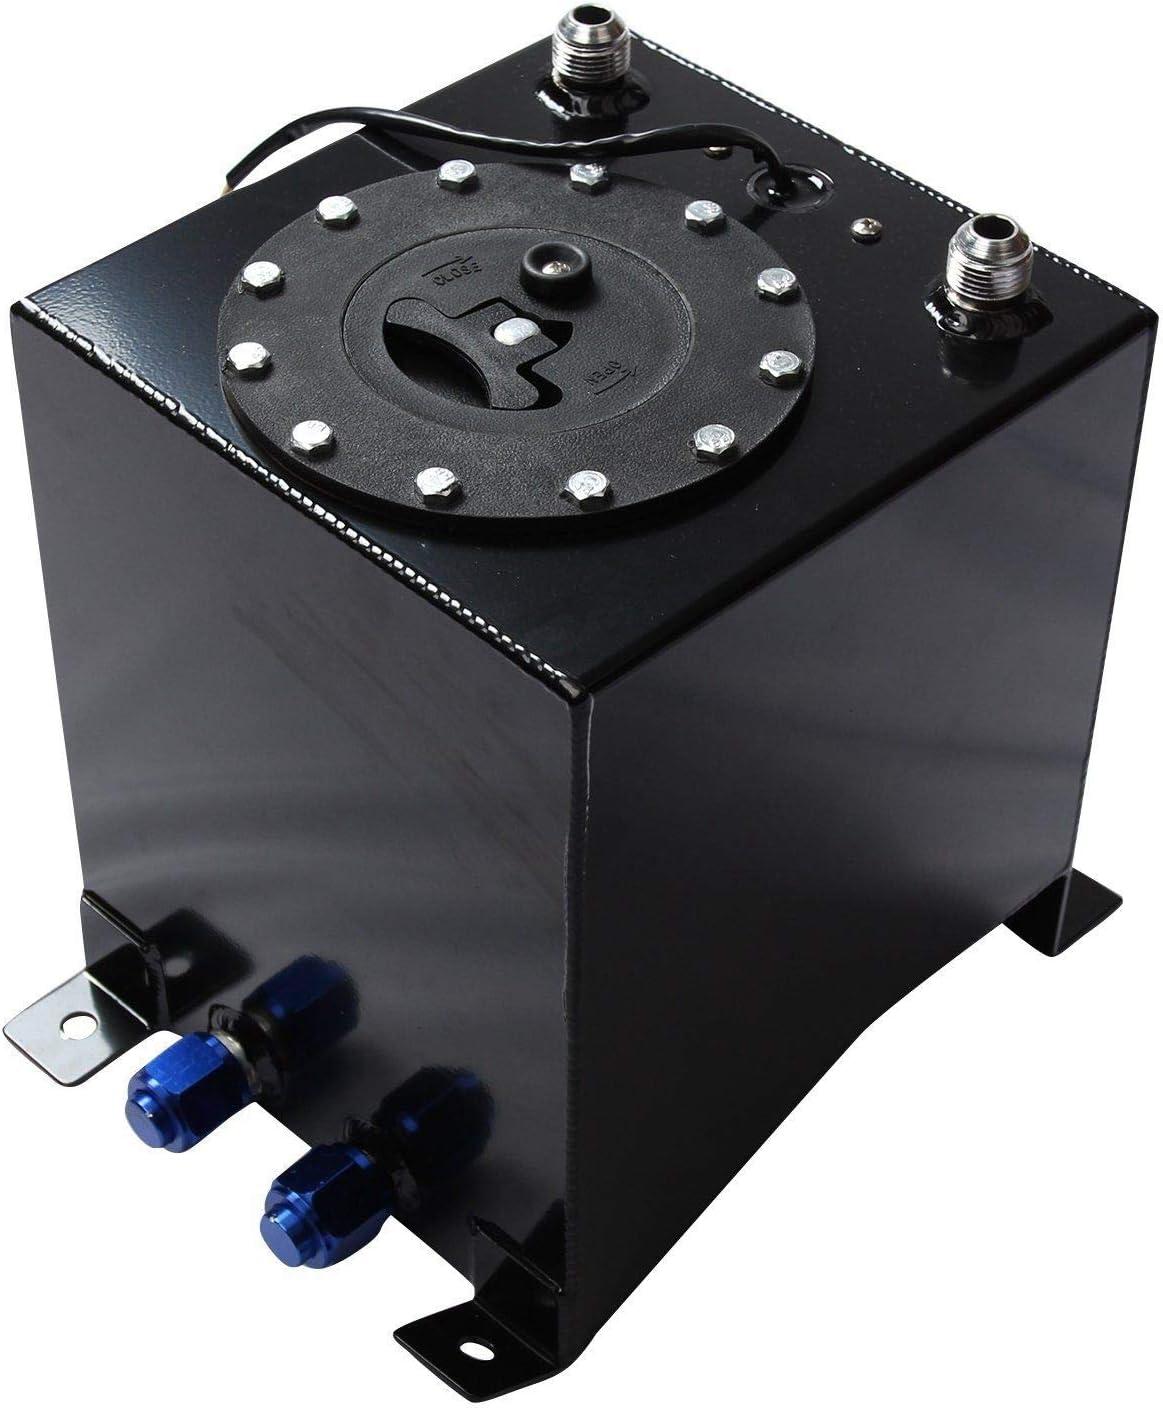 2.5 Gallon 9.5L Fuel Cell Gas Tank Aluminum Polished Race Street Drift Strip Fuel Cell Tank Sliver